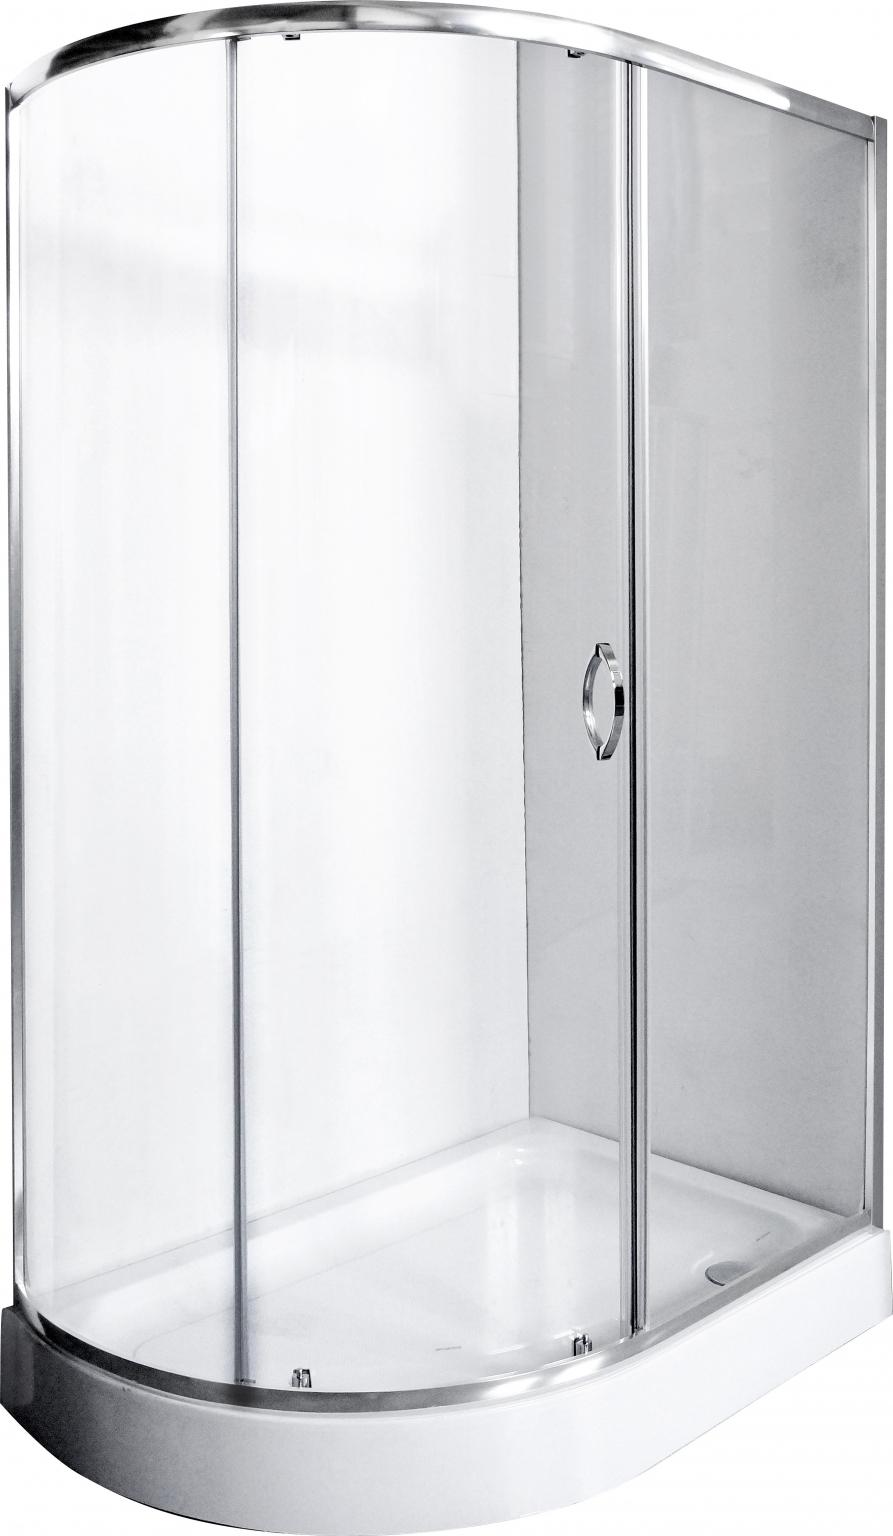 Душевой уголок Rush  120x80 см (FI-A180120-R)